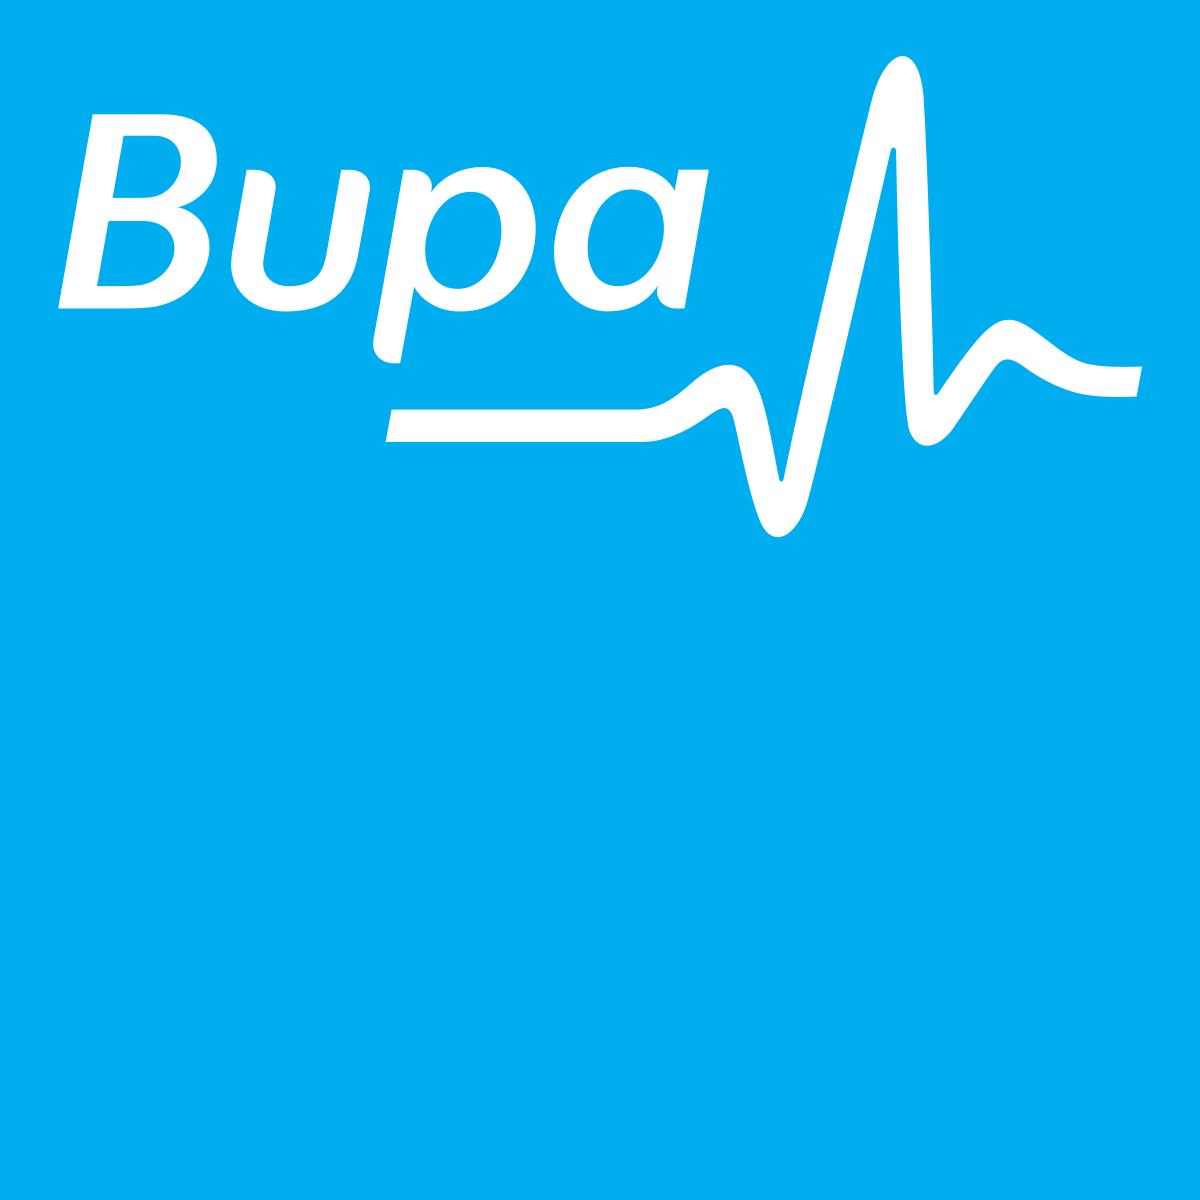 BUPA medical insurance